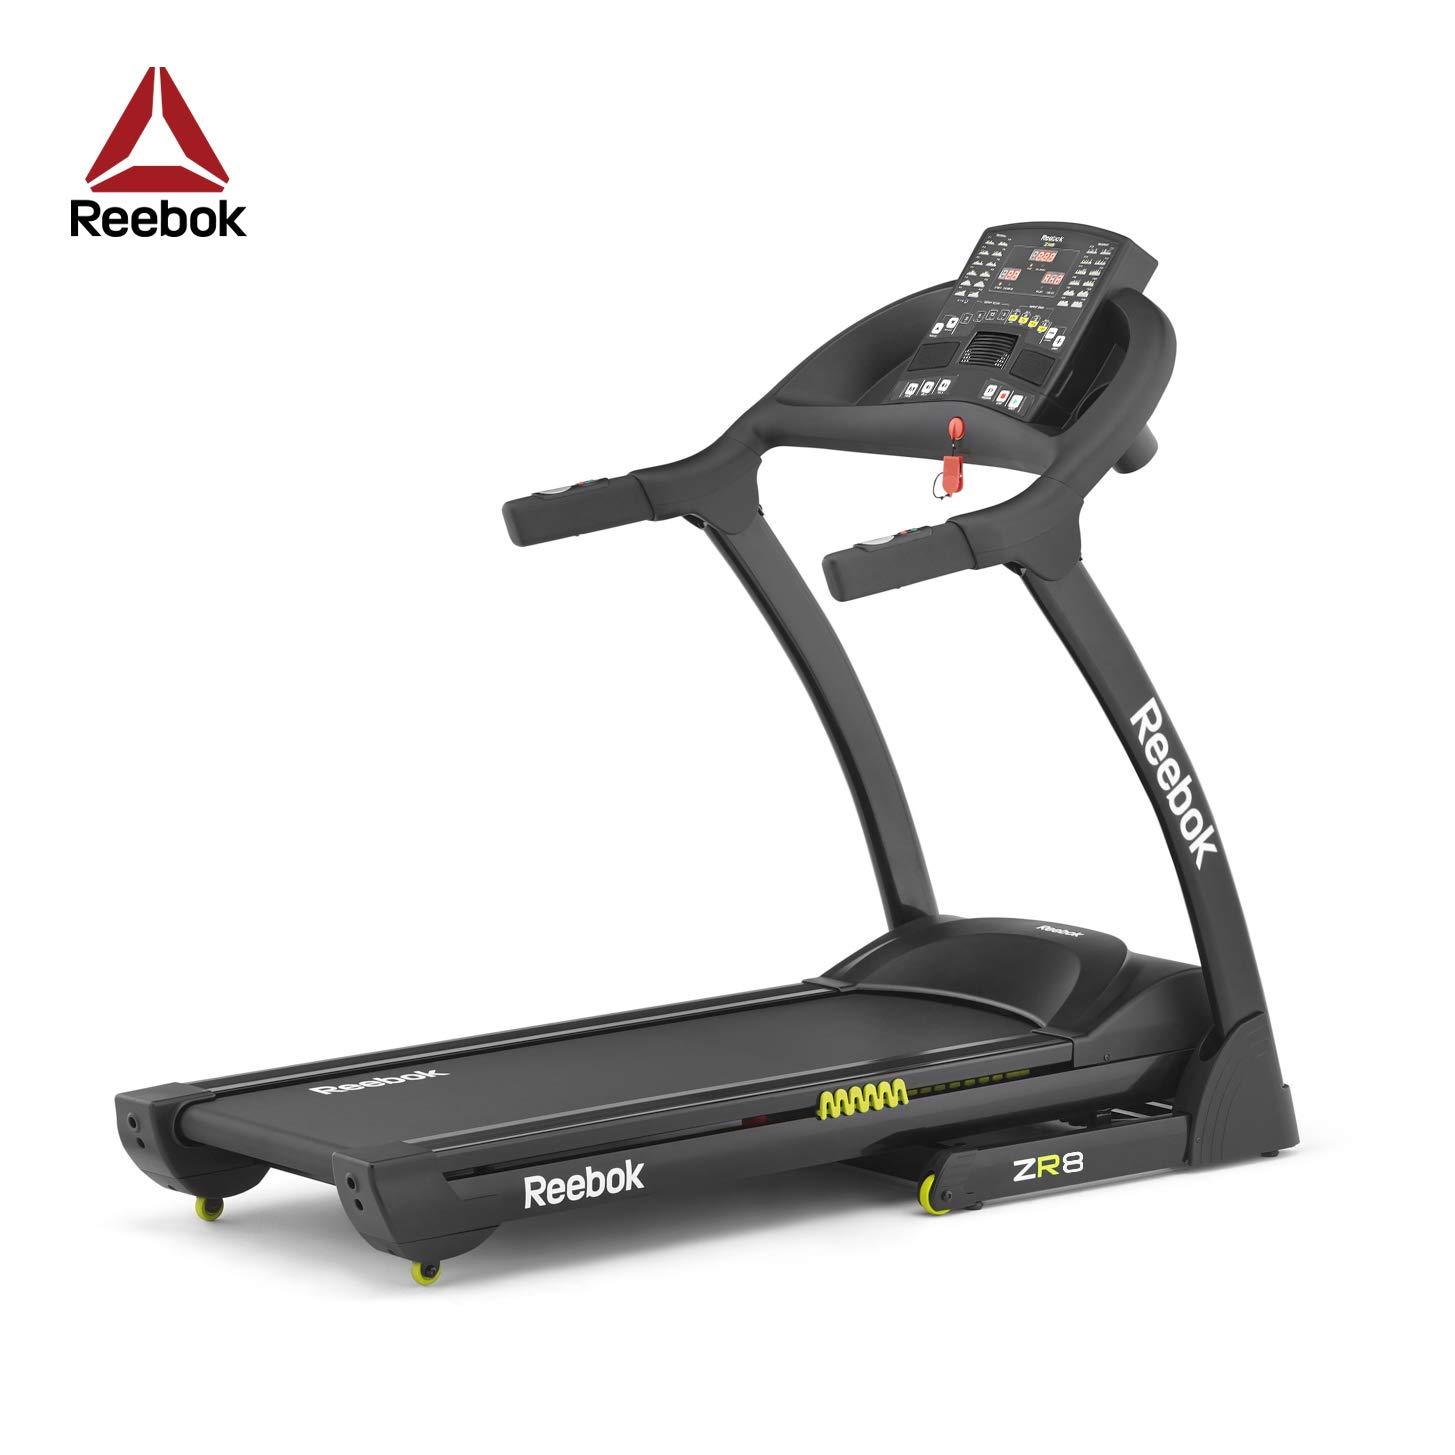 Reebok Zr8 Compact Treadmill Black Amazon Sports Outdoors